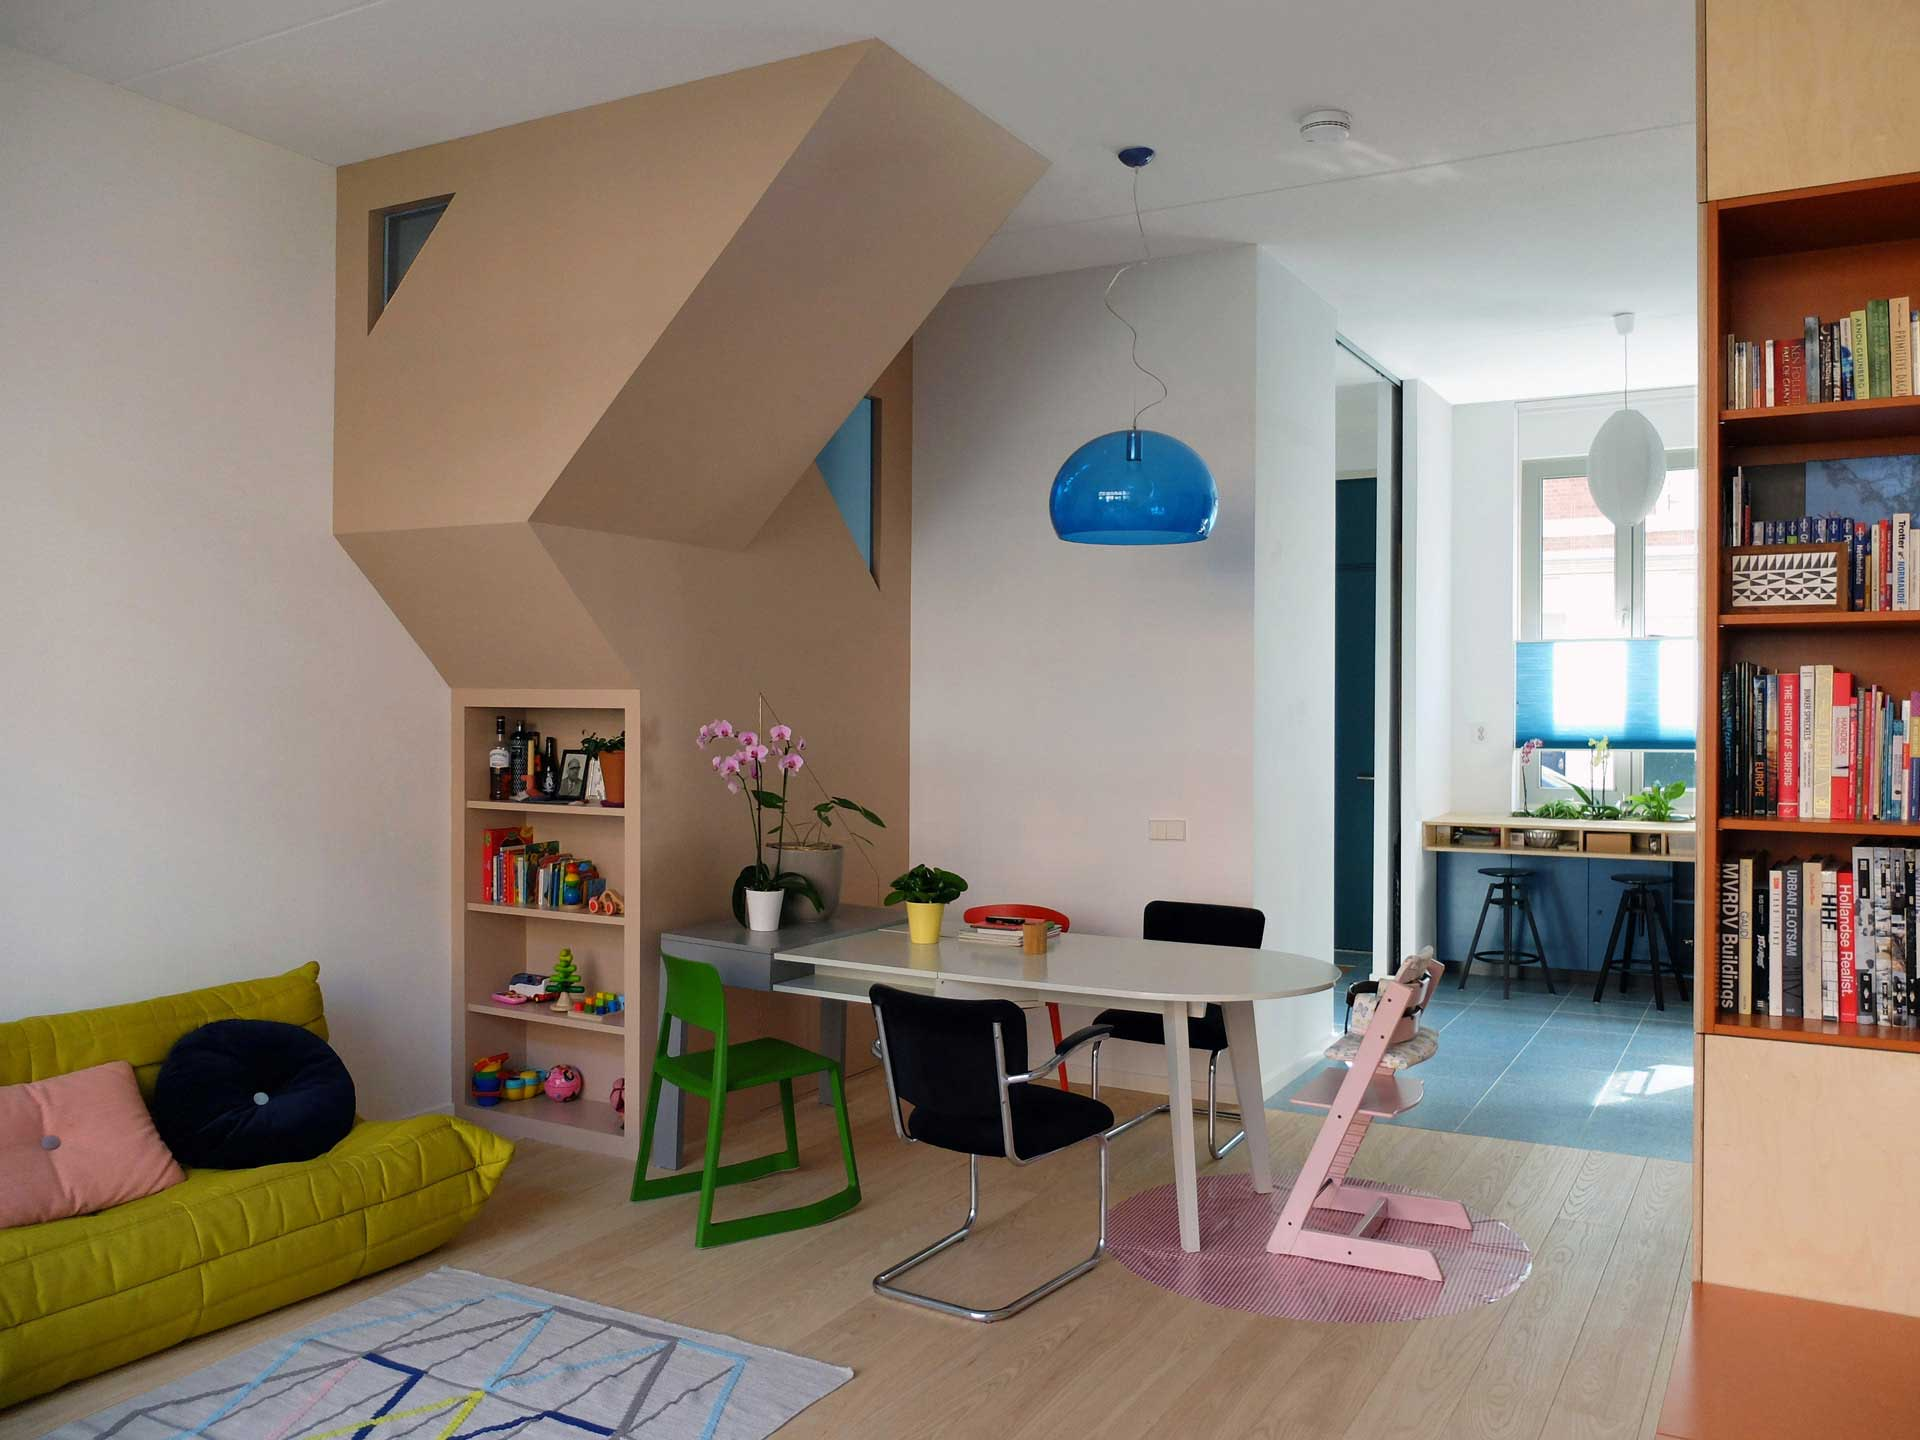 Next-Step-Program-Work-Home-Play-Home